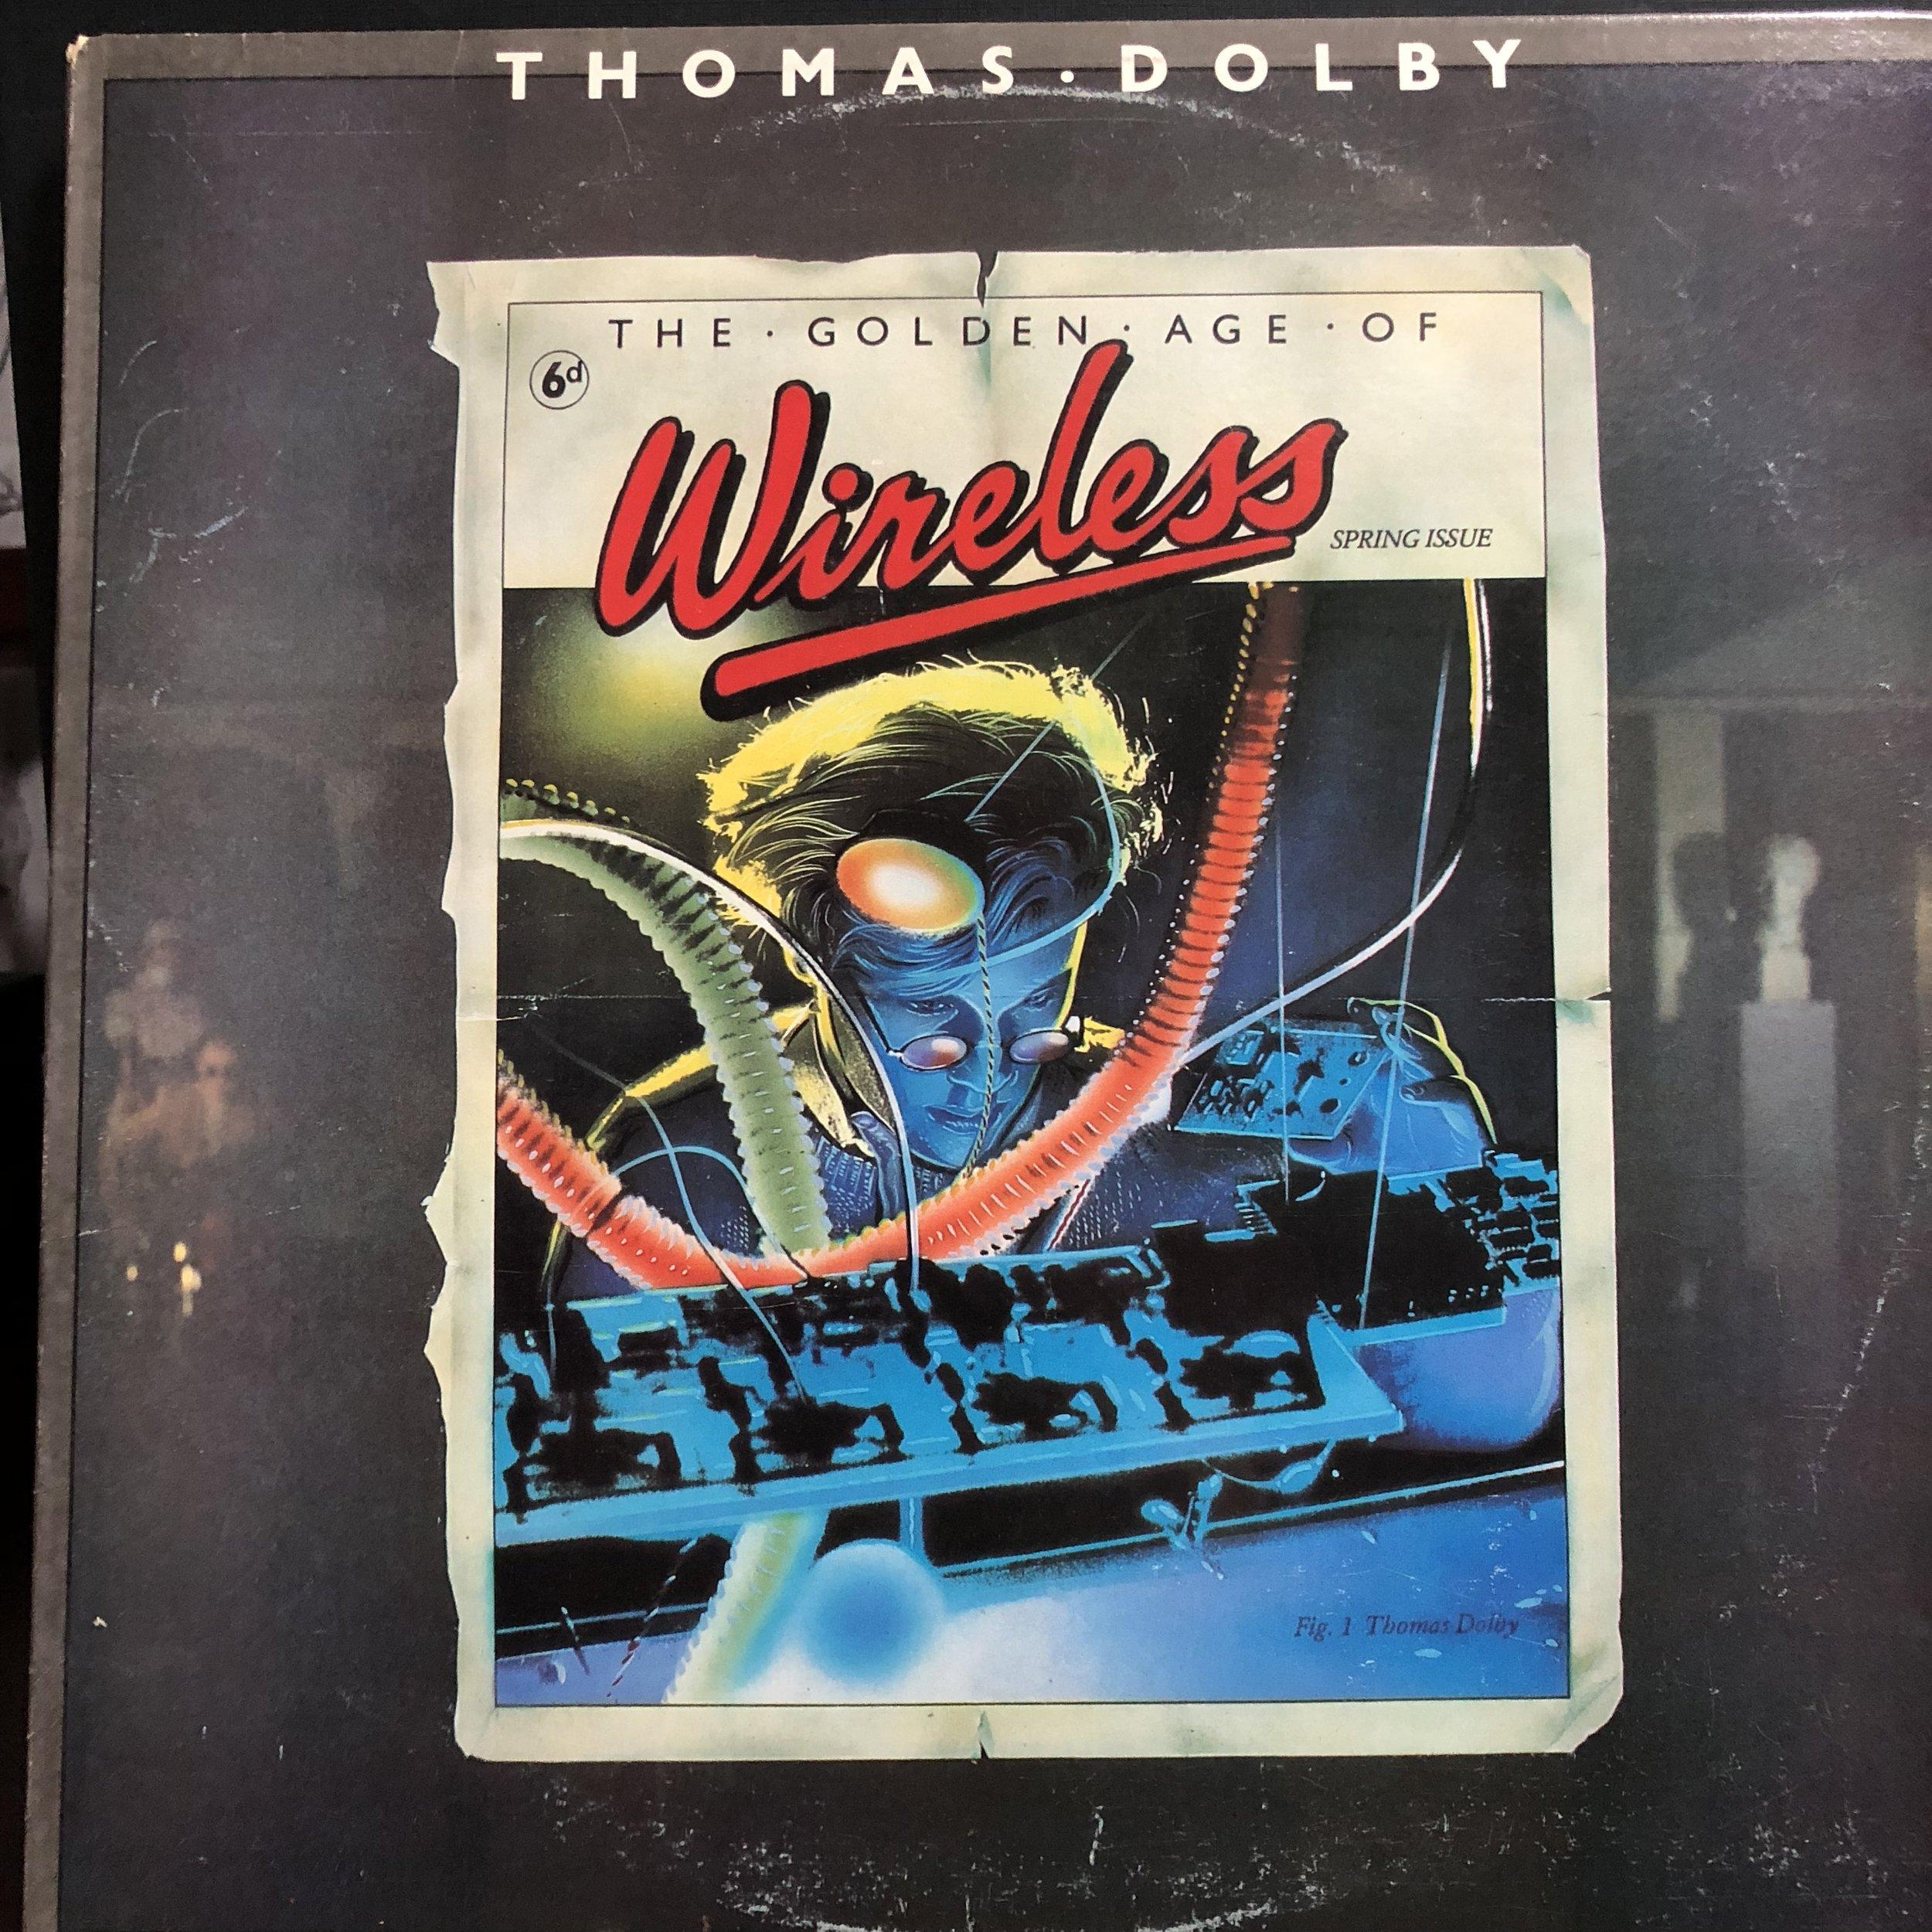 My priceless copy of the album Wireless